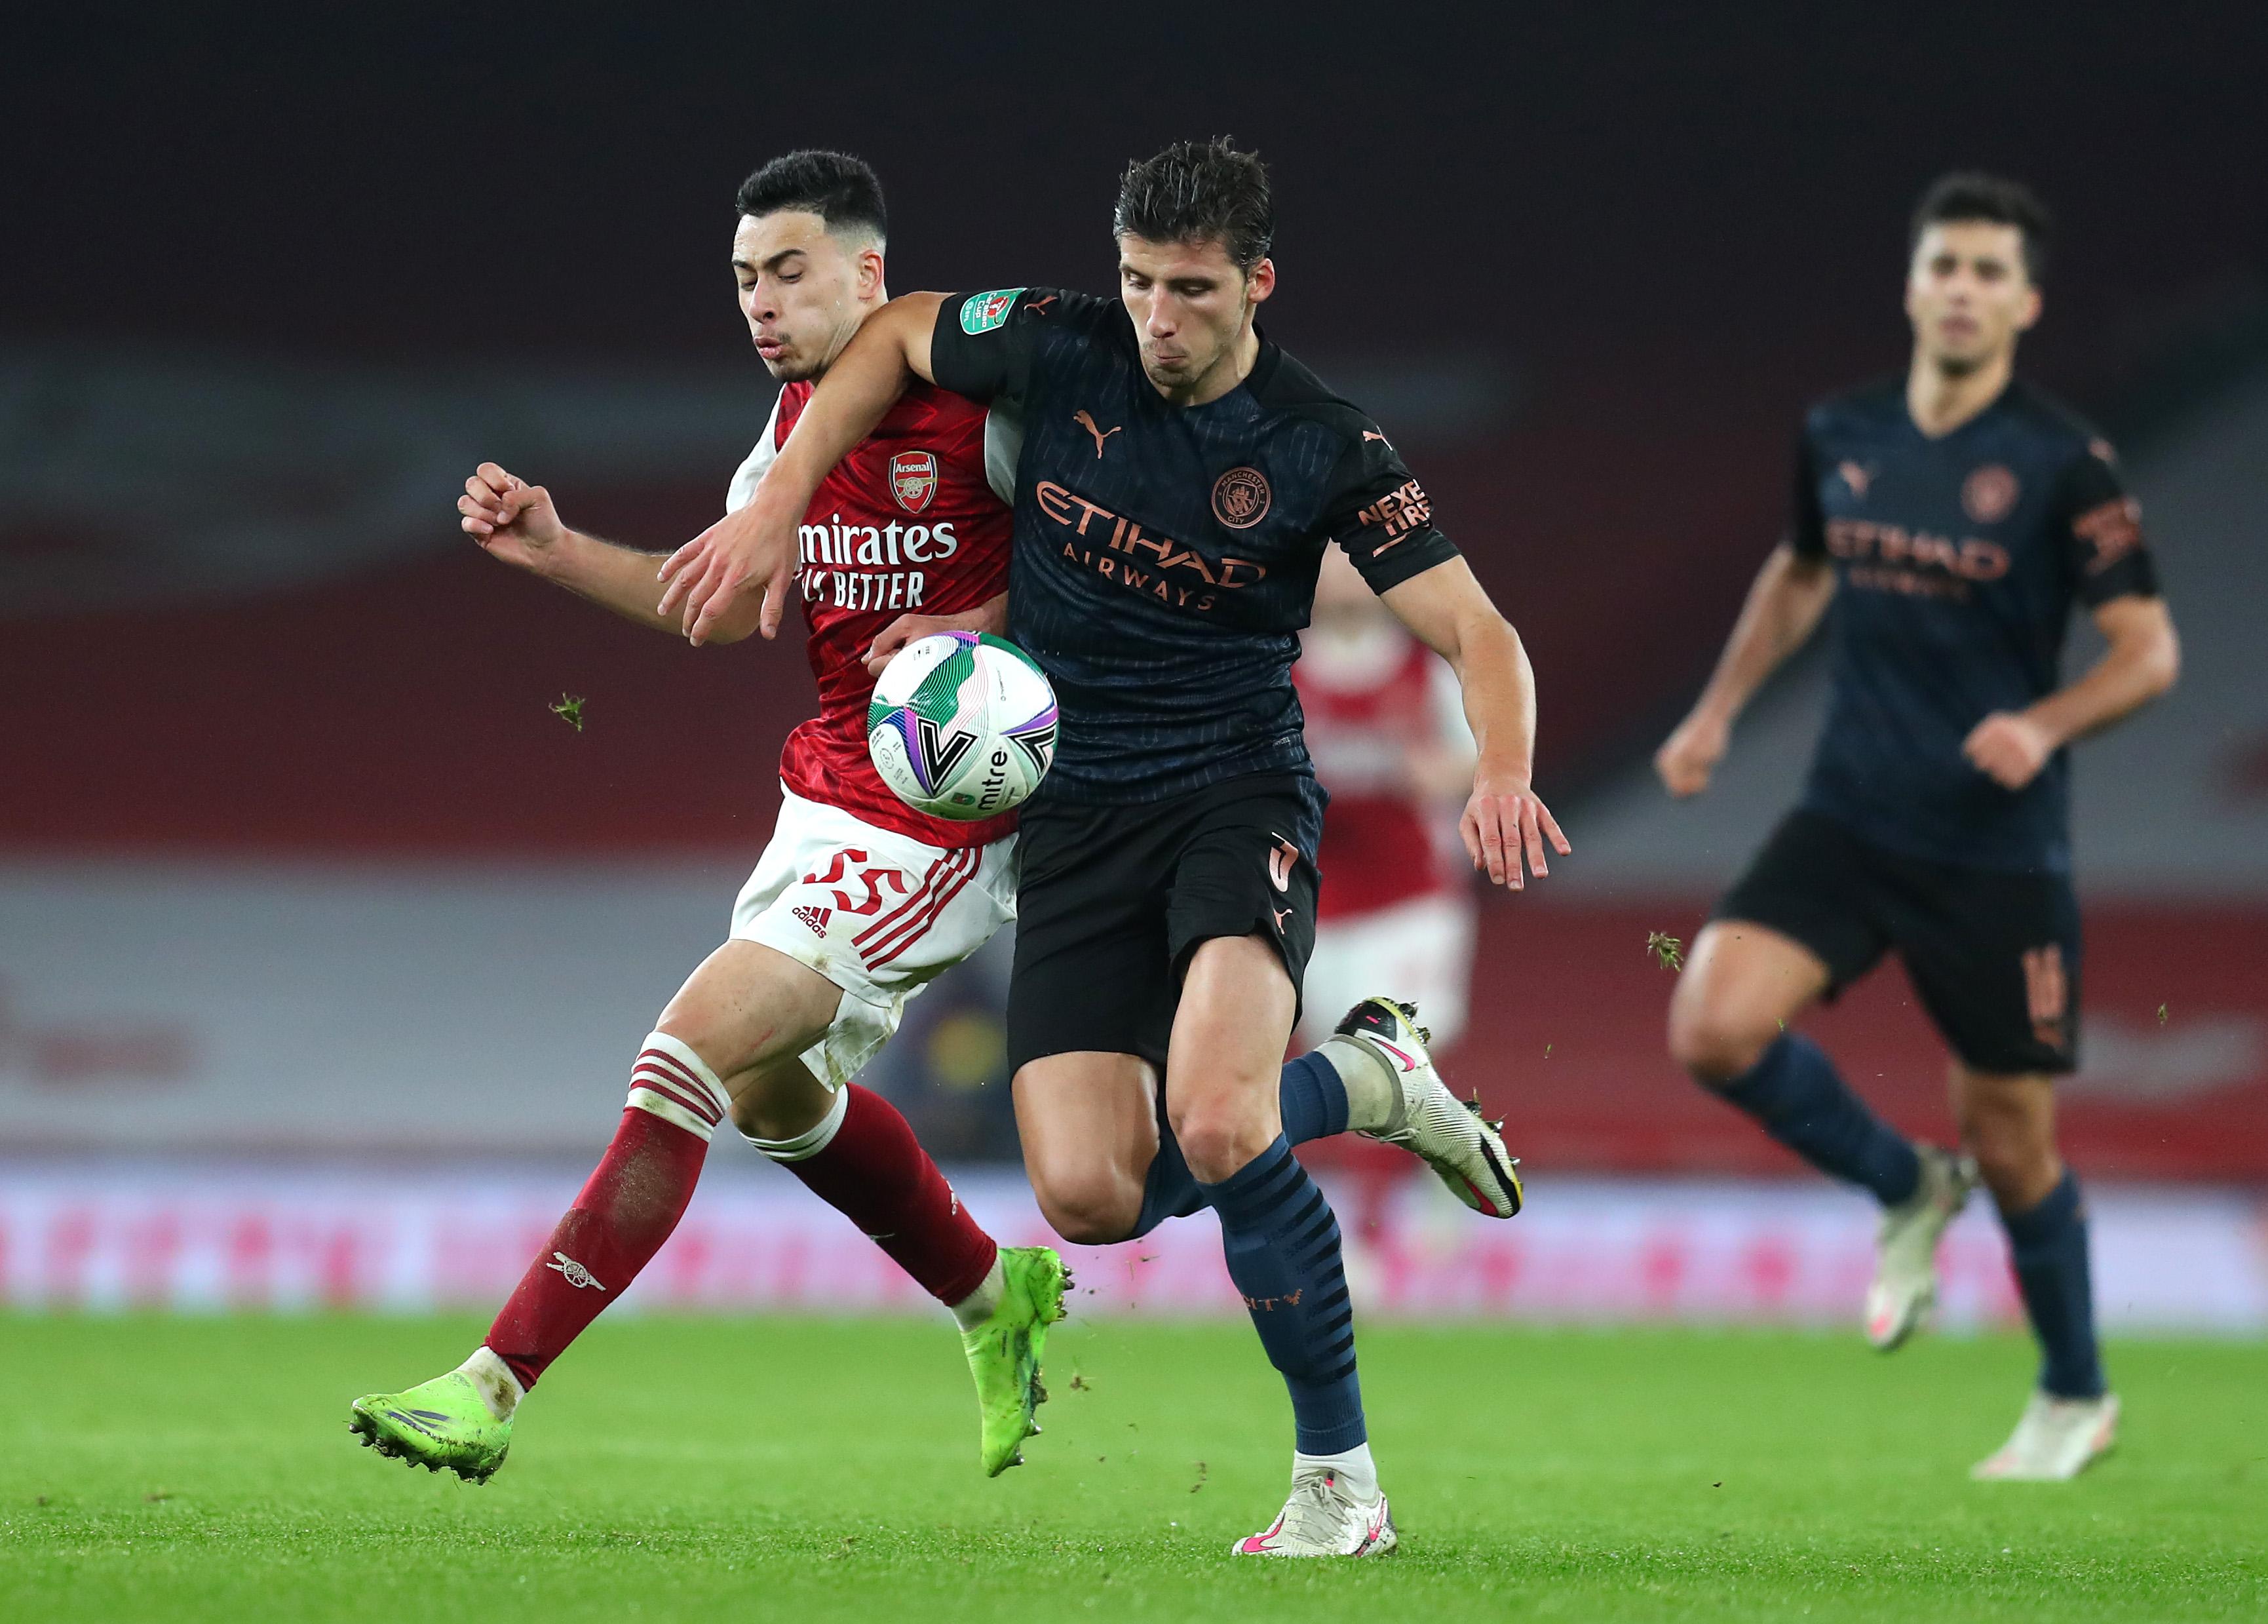 Arsenal v Manchester City - Carabao Cup Quarter Final